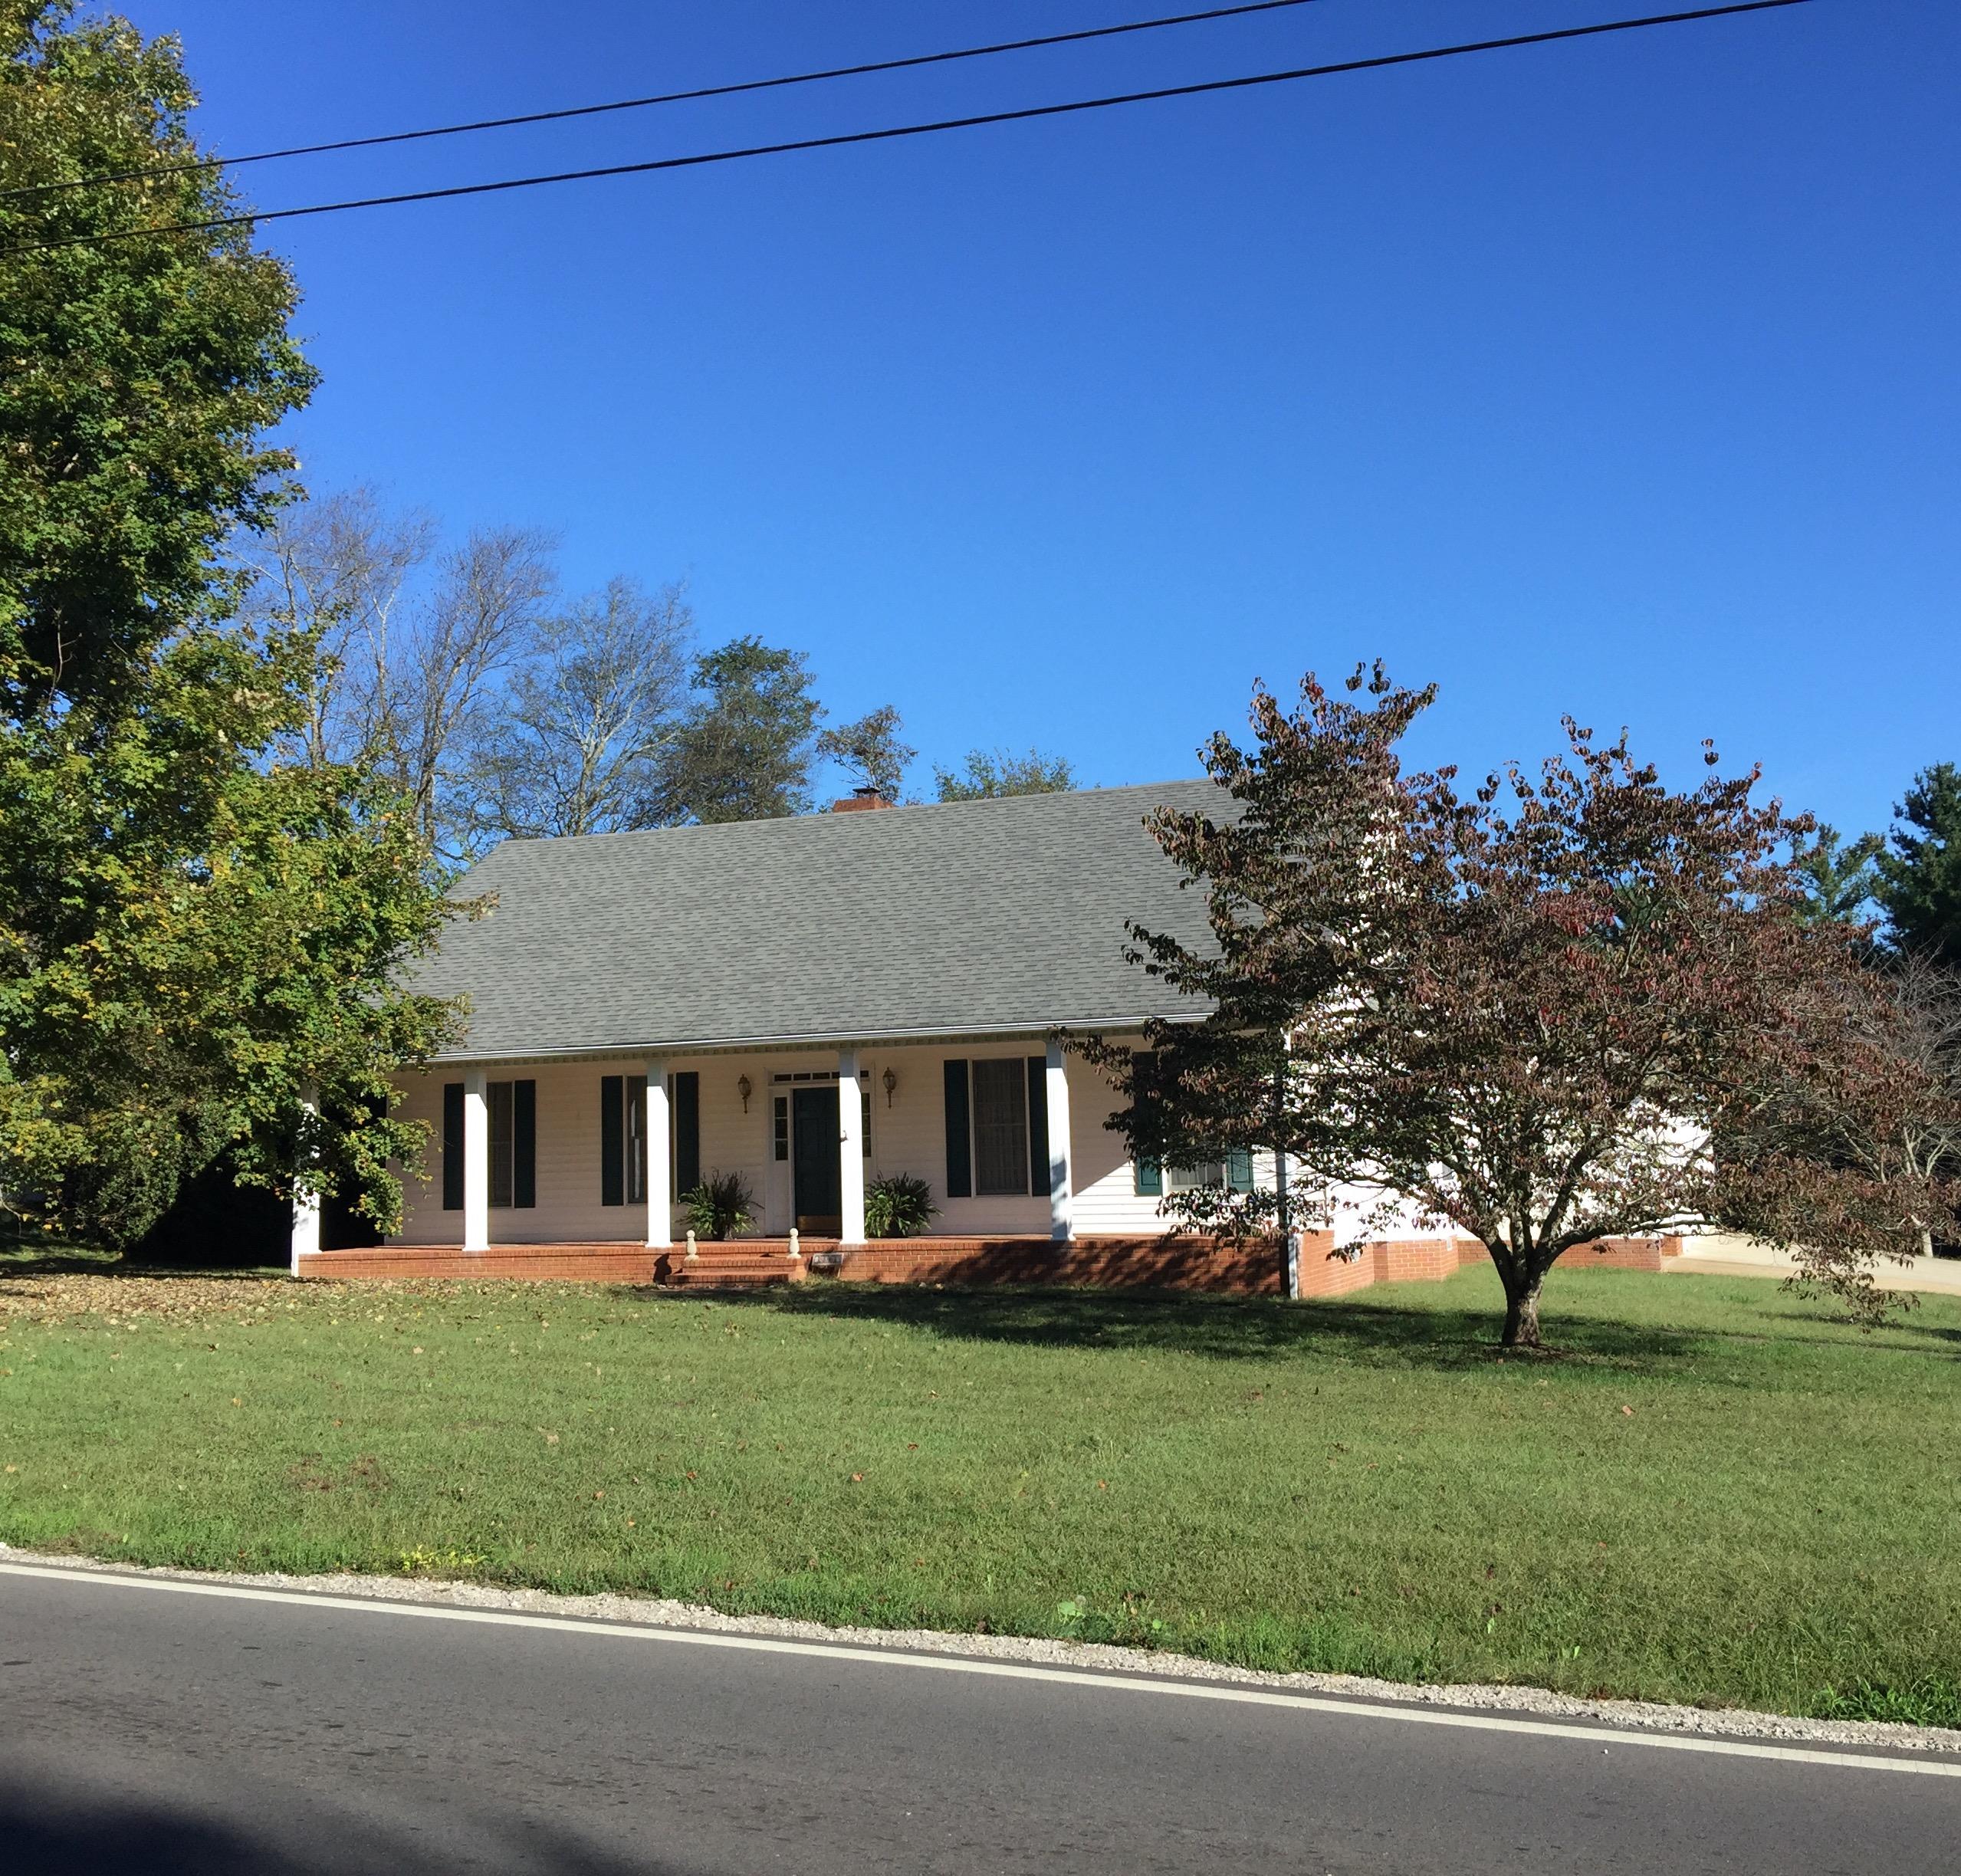 18745 UPPER FORT HAMPTON ROAD, Elkmont, Alabama 35620